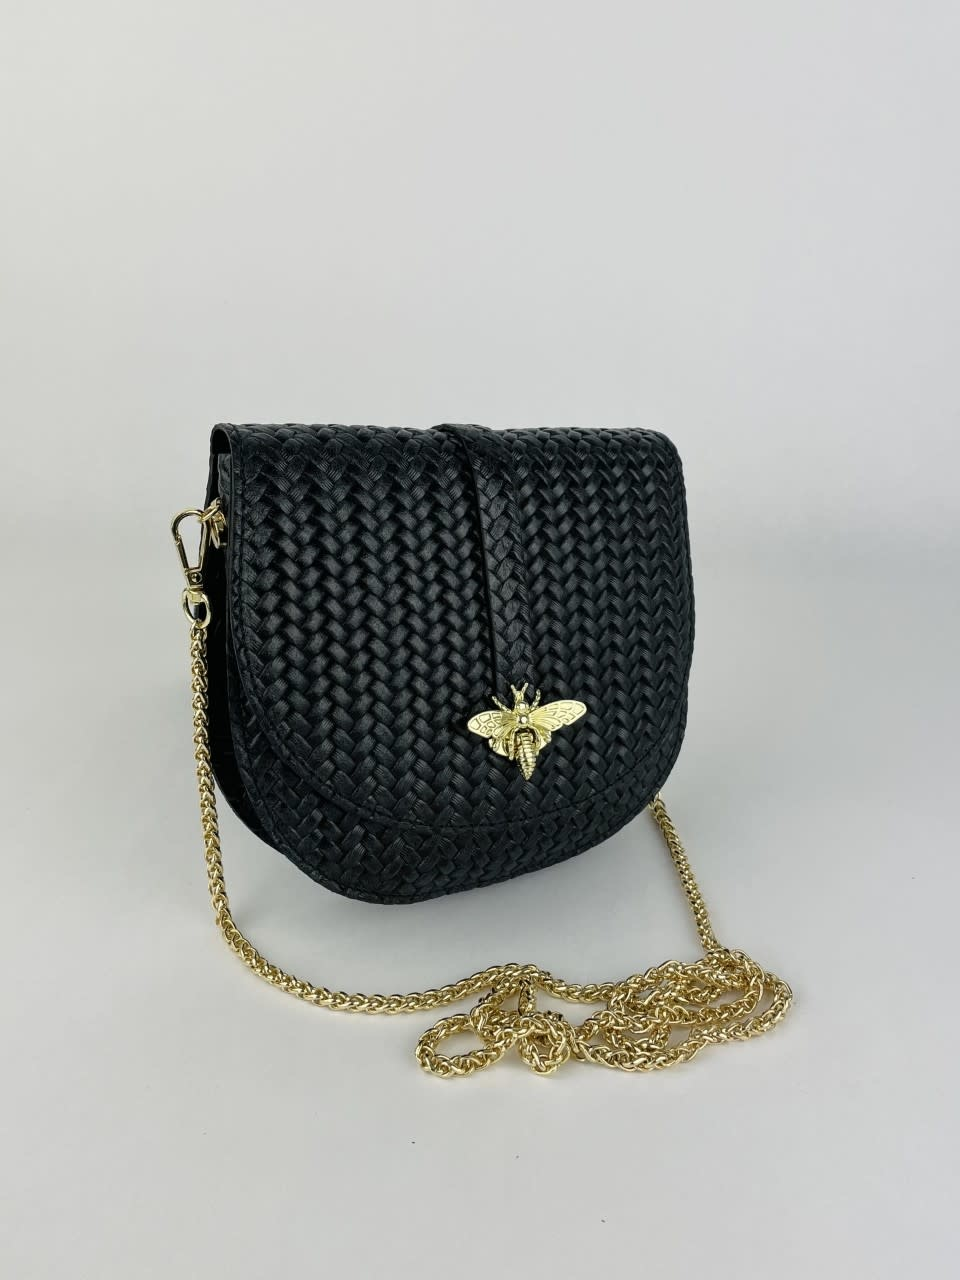 Cléo calf leather dragonfly bag Black-2